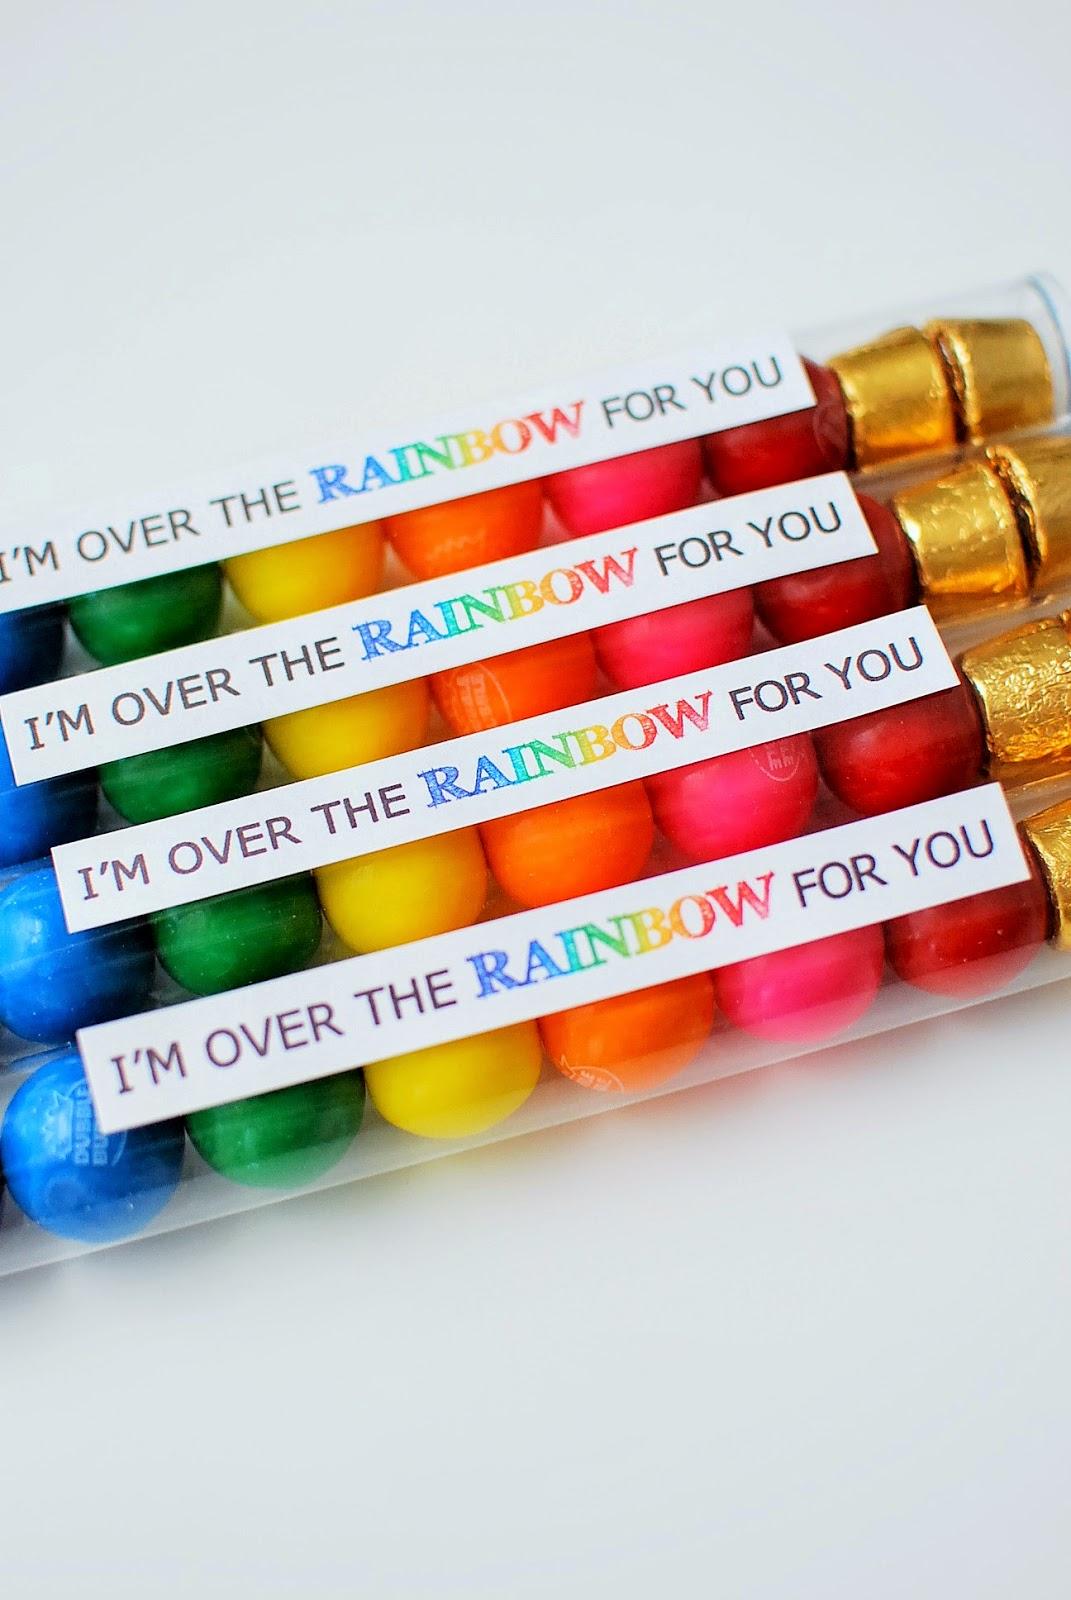 http://3.bp.blogspot.com/-chv6SA1xvag/VPiiibXAj-I/AAAAAAAAN74/5FdK8eldKkI/s1600/rainbow-patrick-flag%2B(2).JPG